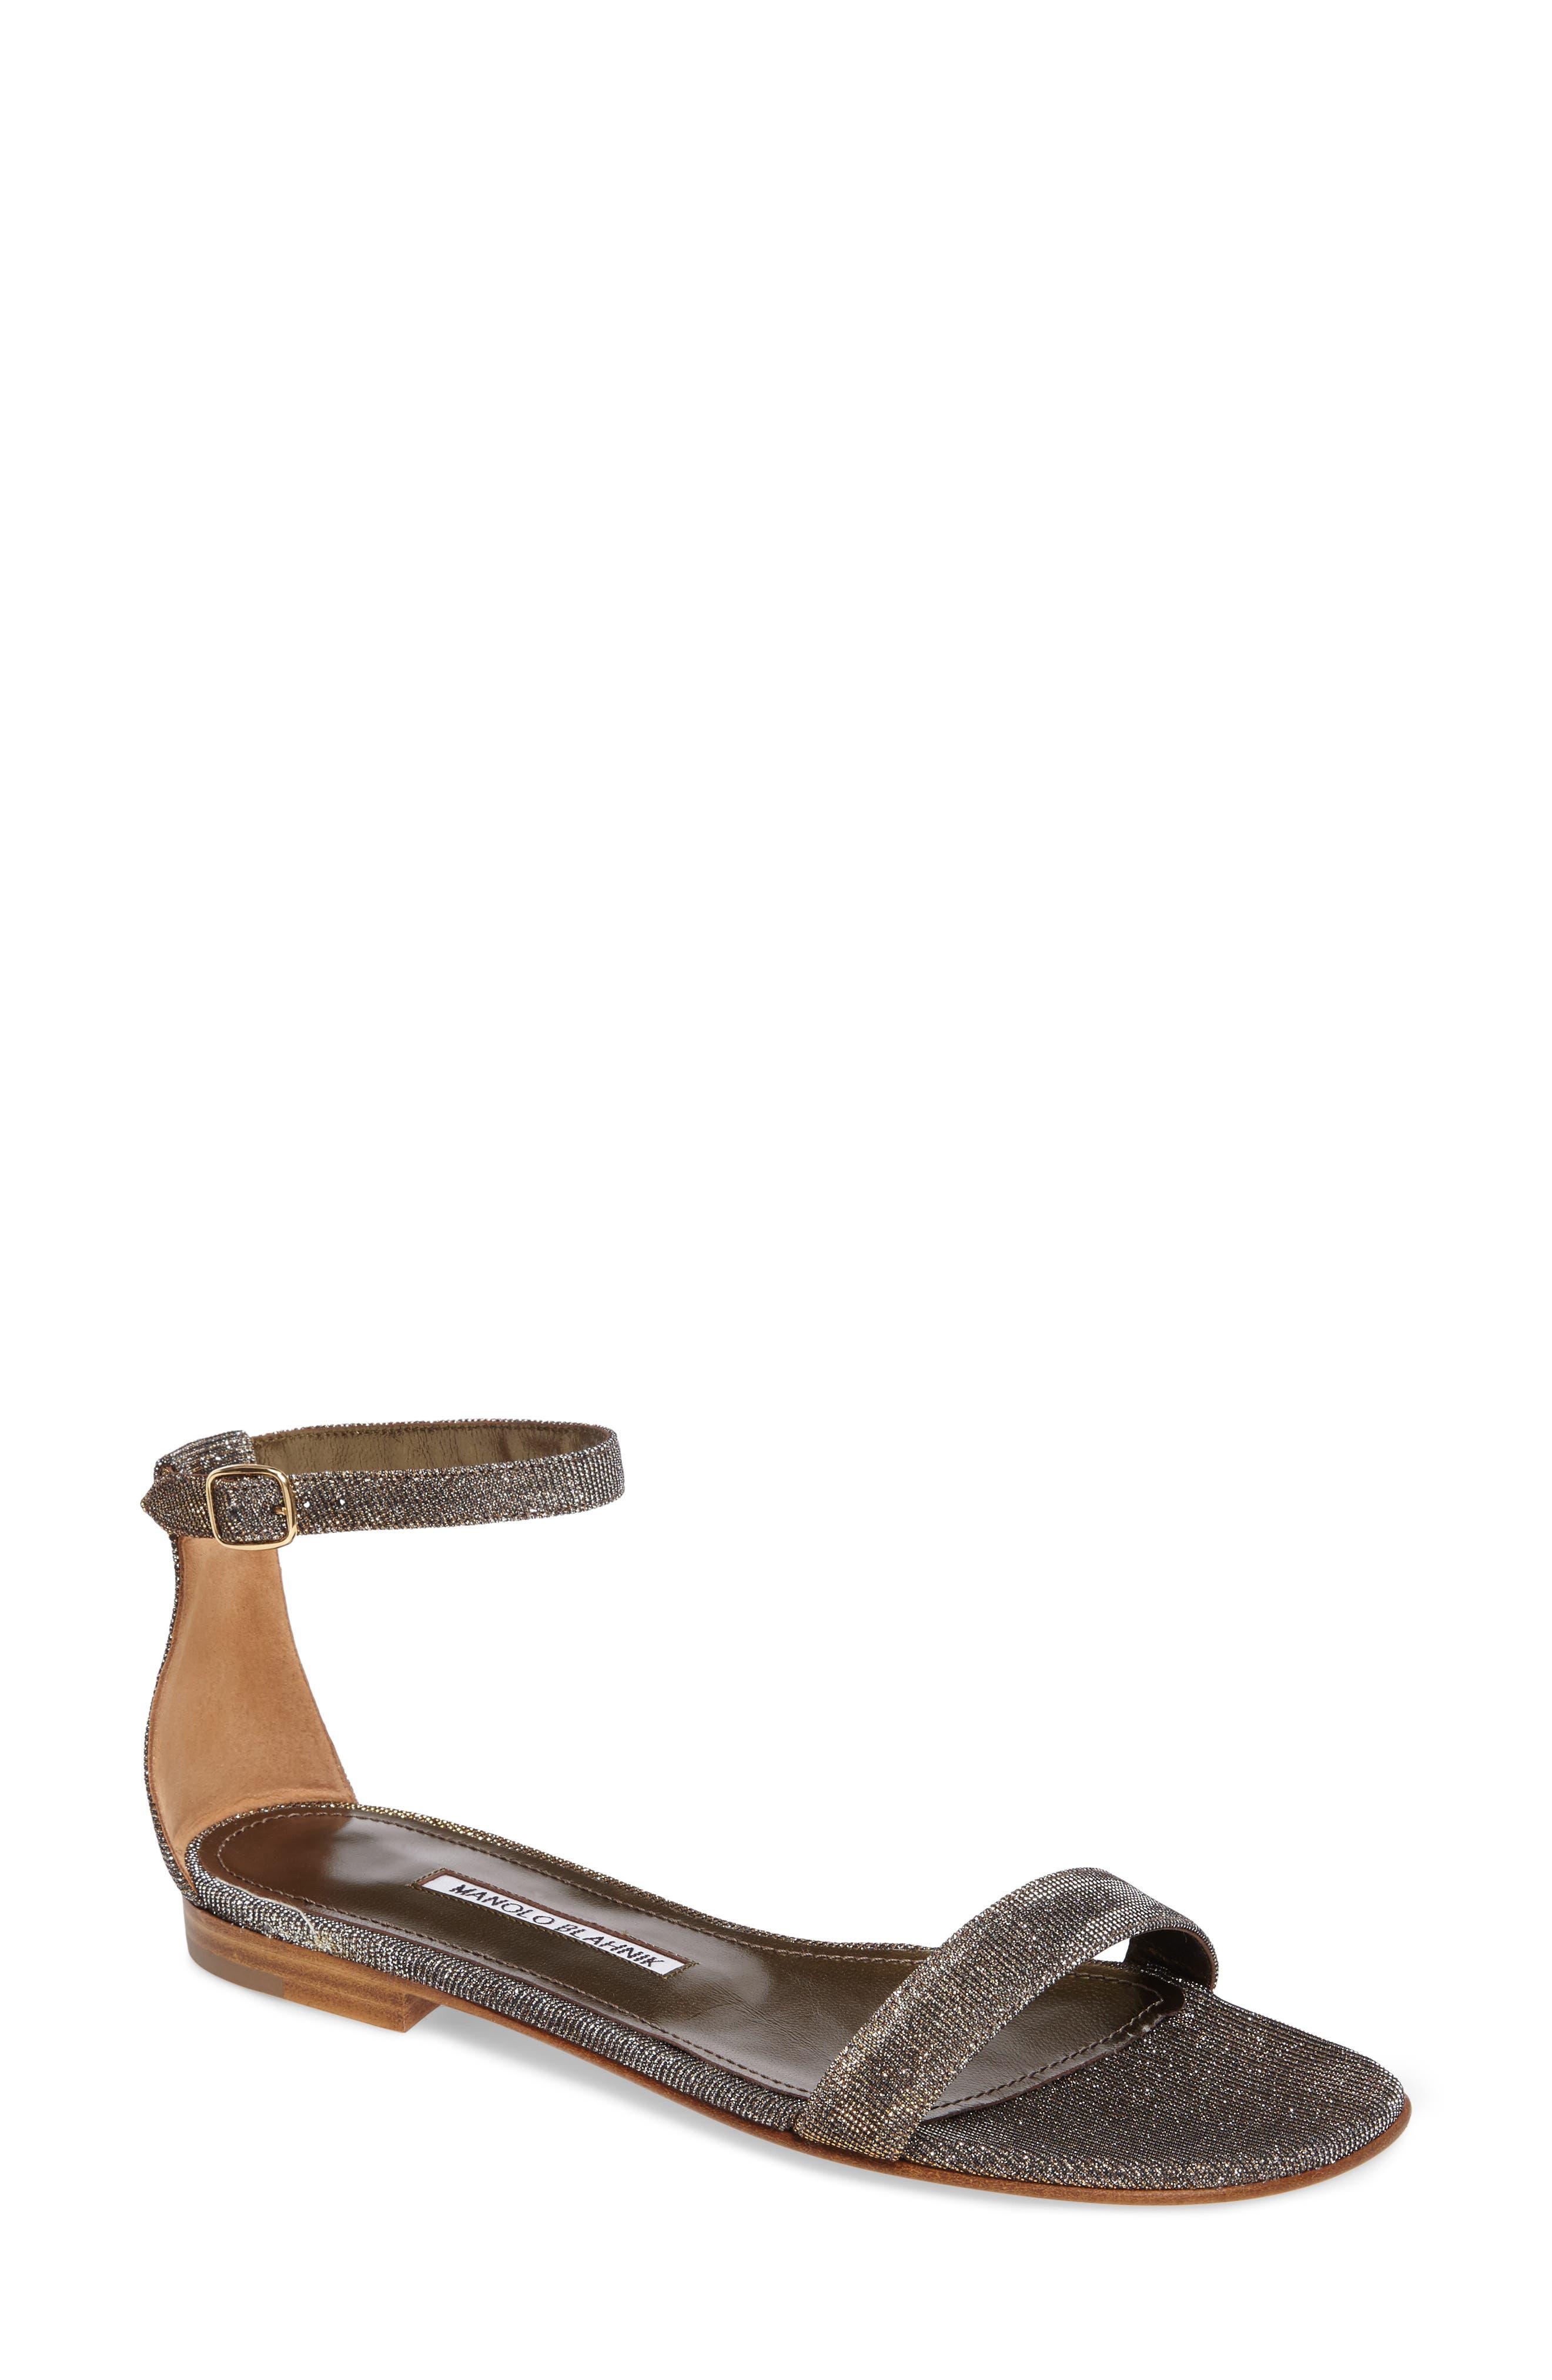 Alternate Image 1 Selected - Manolo Blahnik Chafla Ankle Strap Sandal (Women)